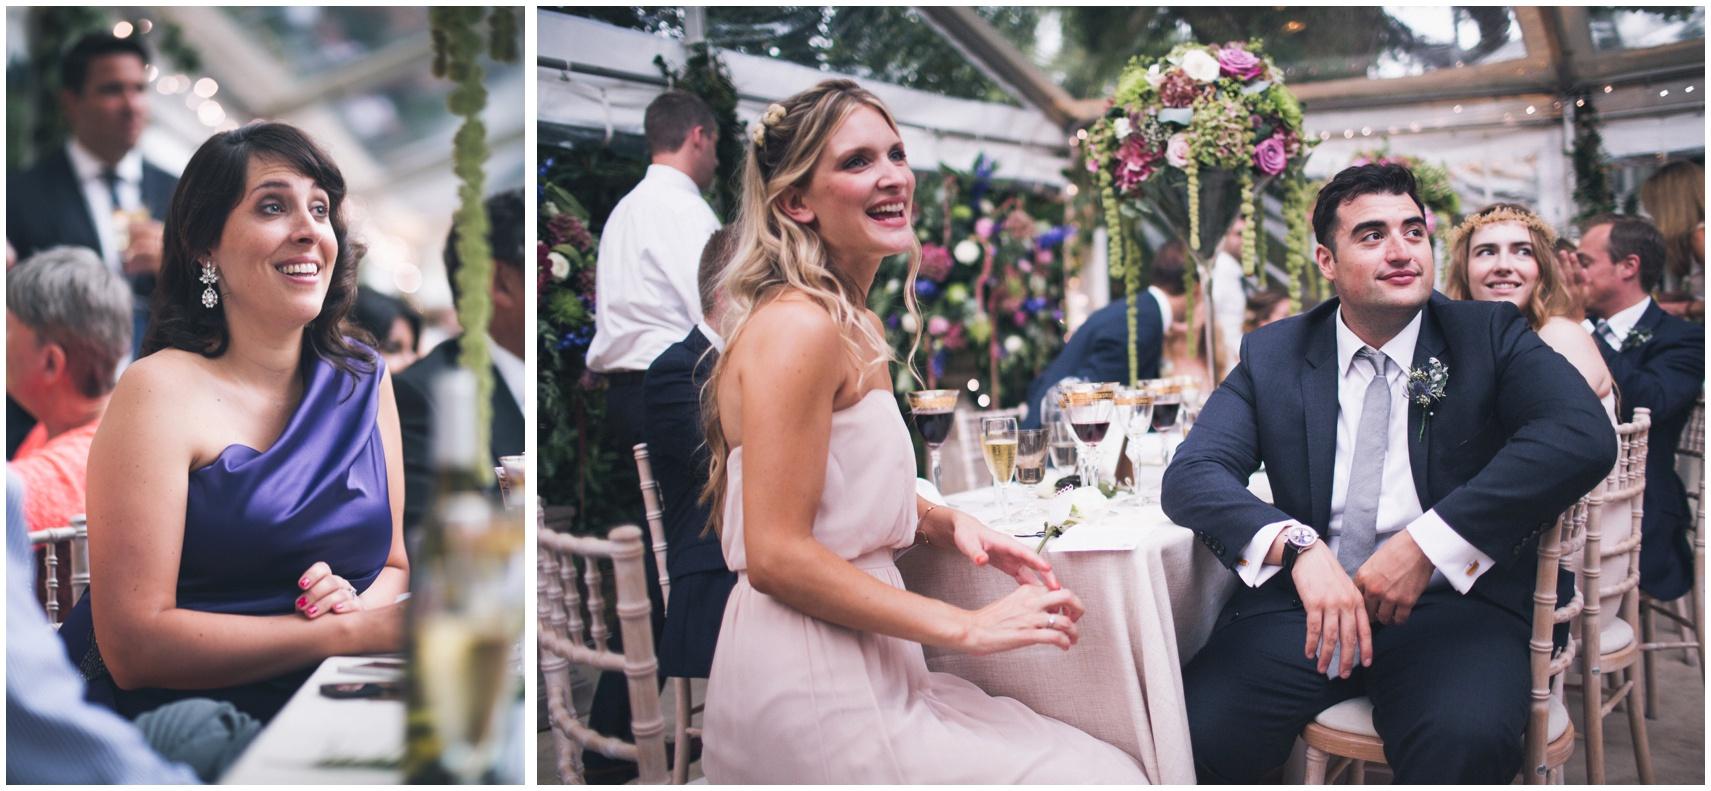 BMC Wedding photography Rutland_0342.jpg